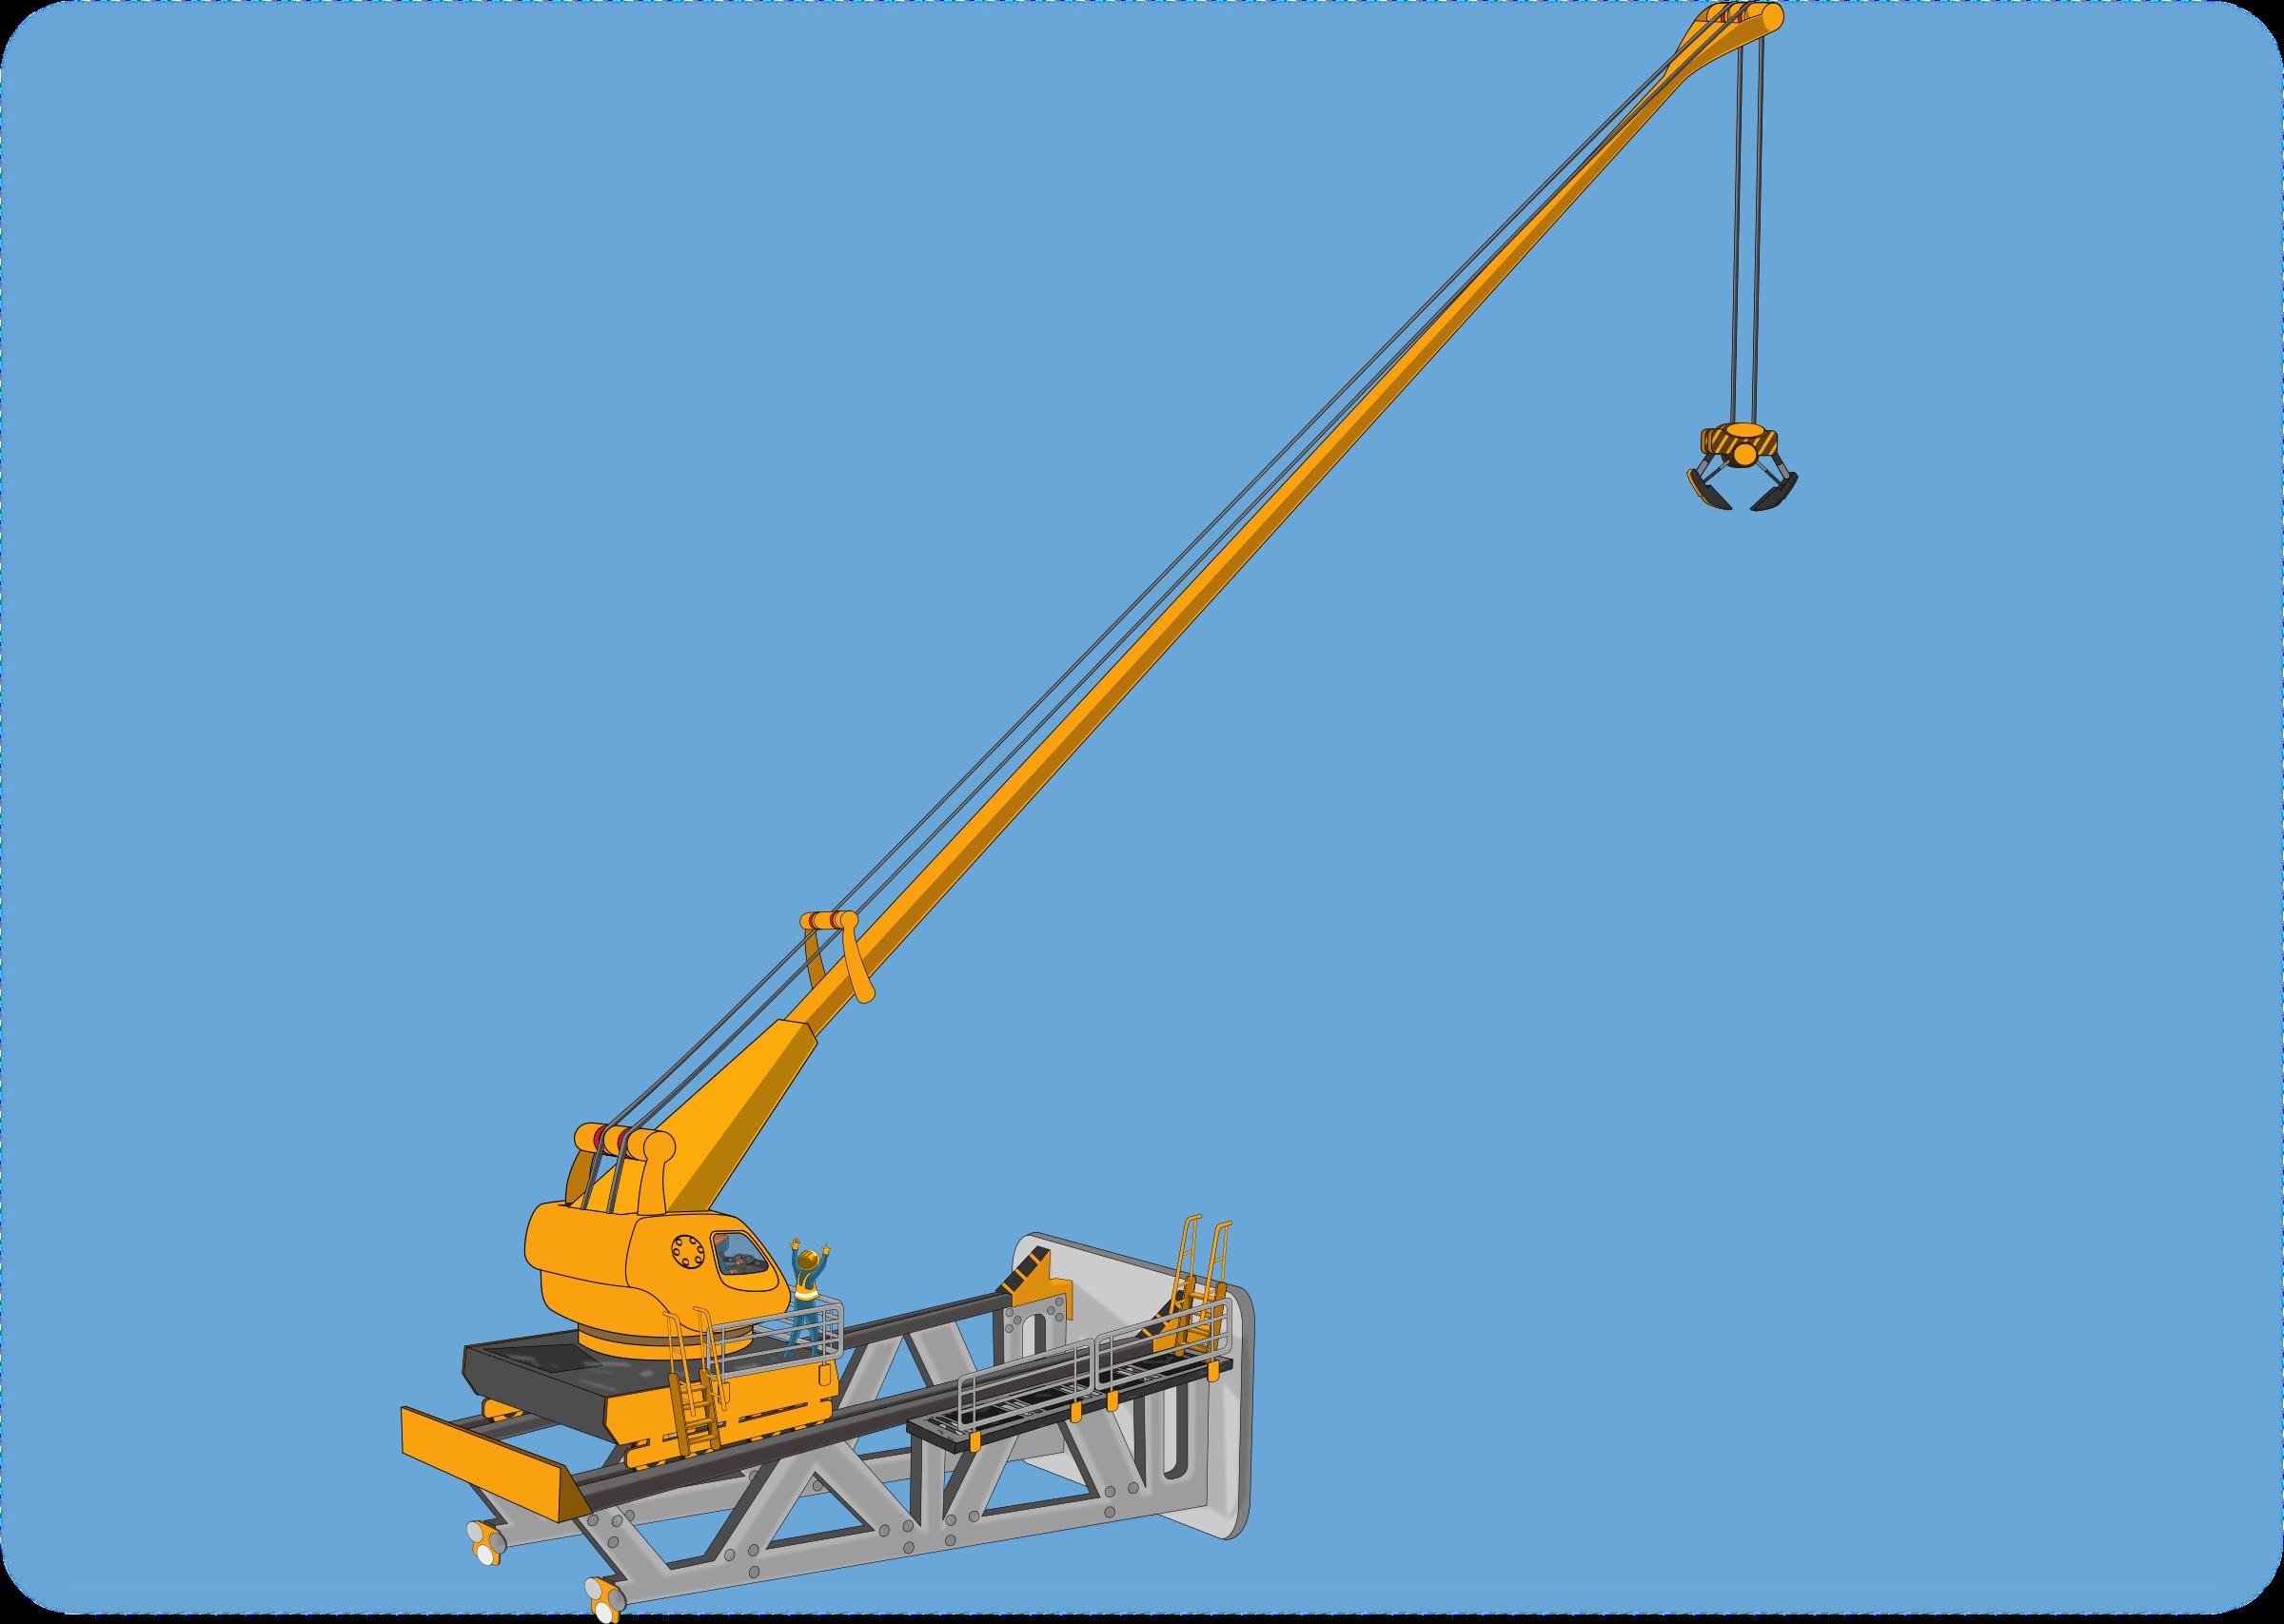 Big image png. Crane clipart under construction